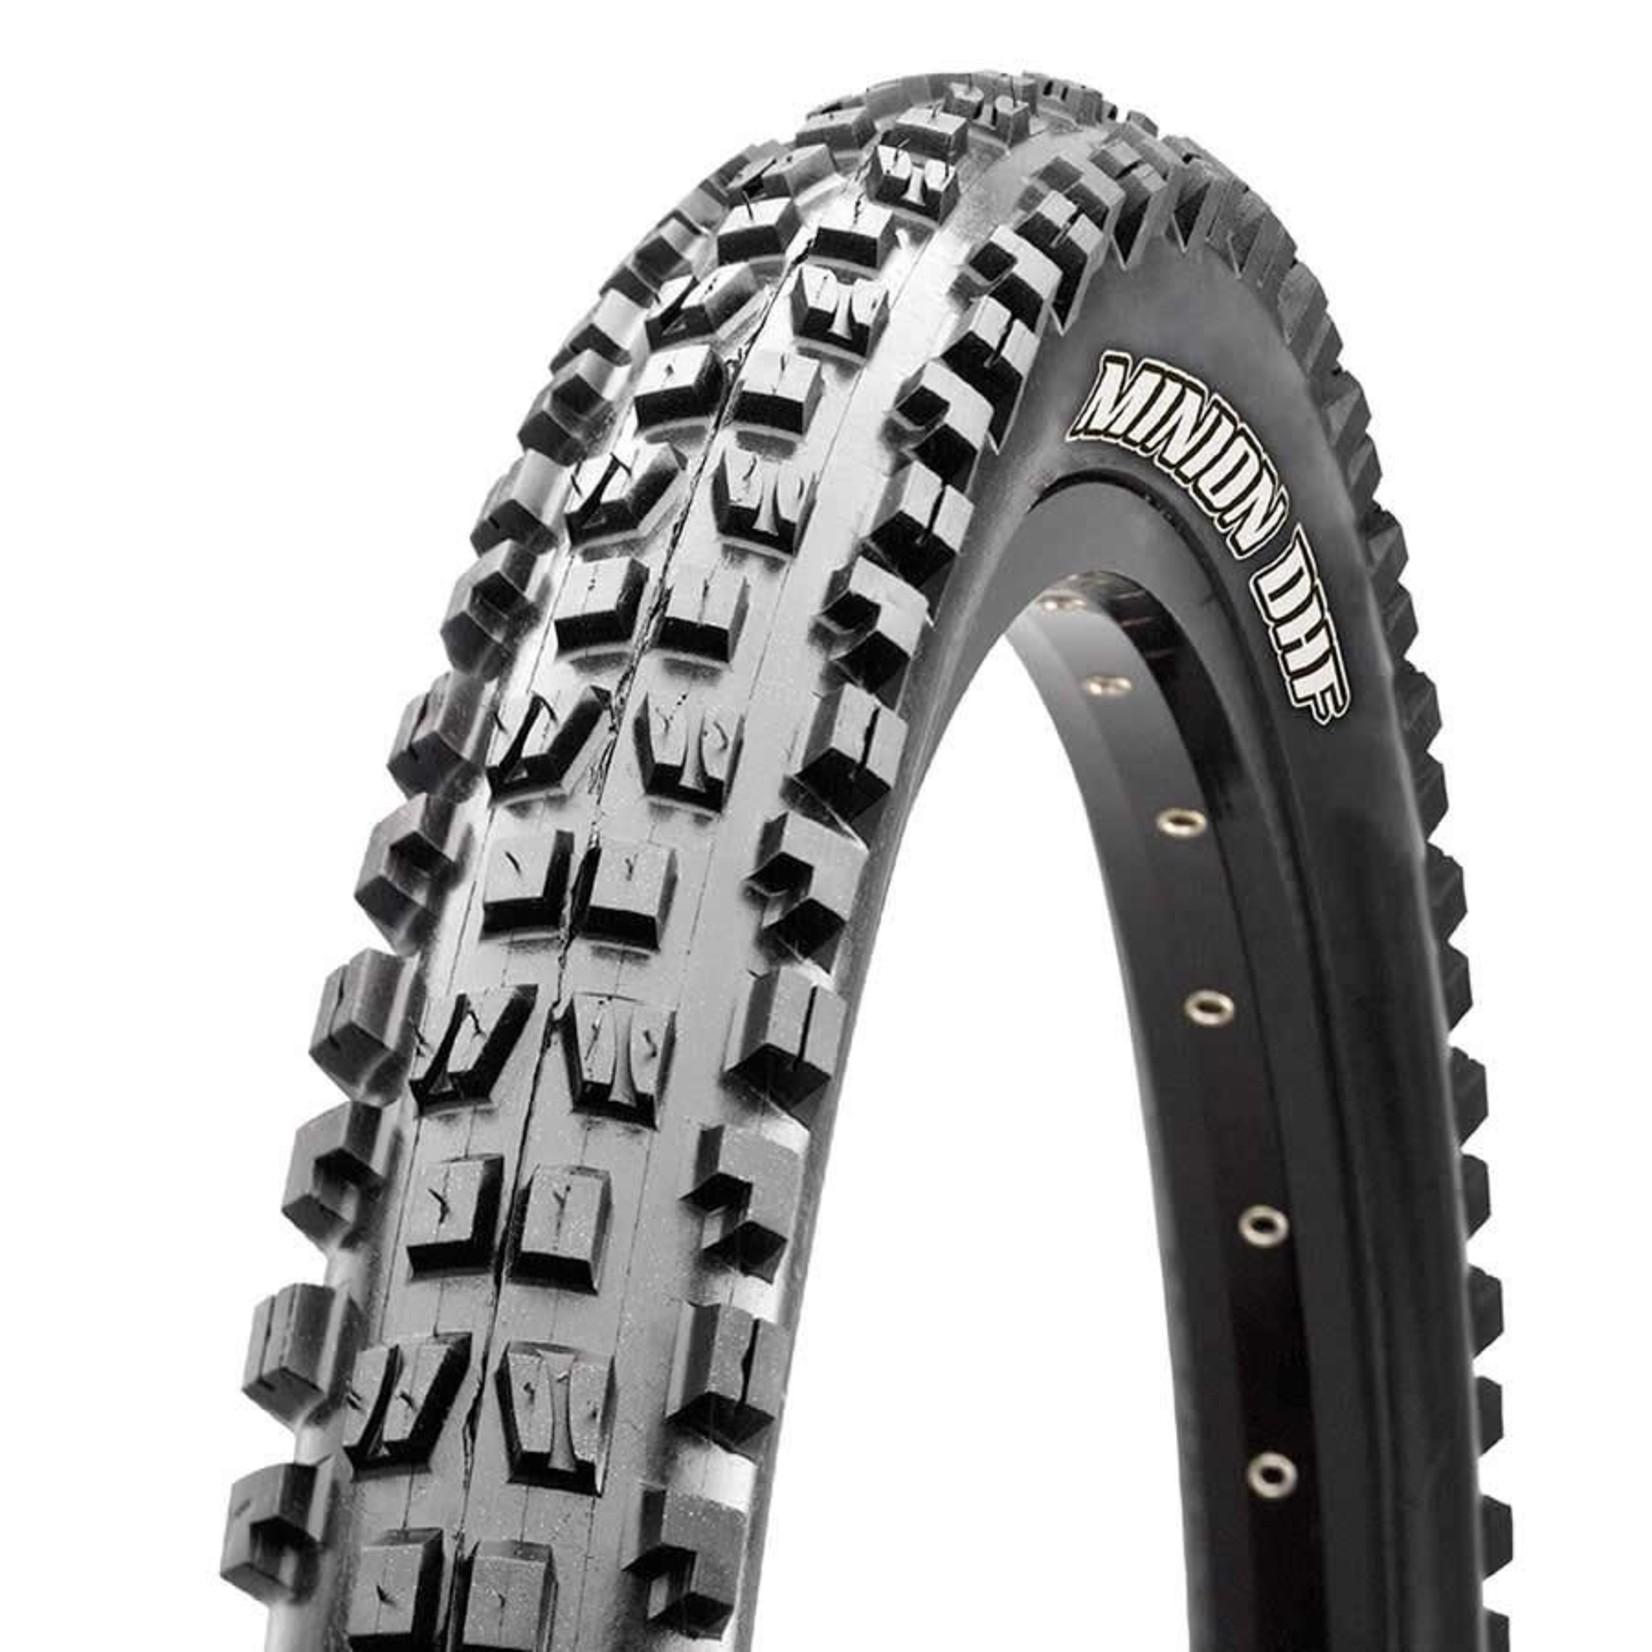 Maxxis Minion DHF, Tire, 29''x2.50, Folding, Tubeless Ready, 3C Maxx Grip, EXO , Wide Trail, 60TPI, Black